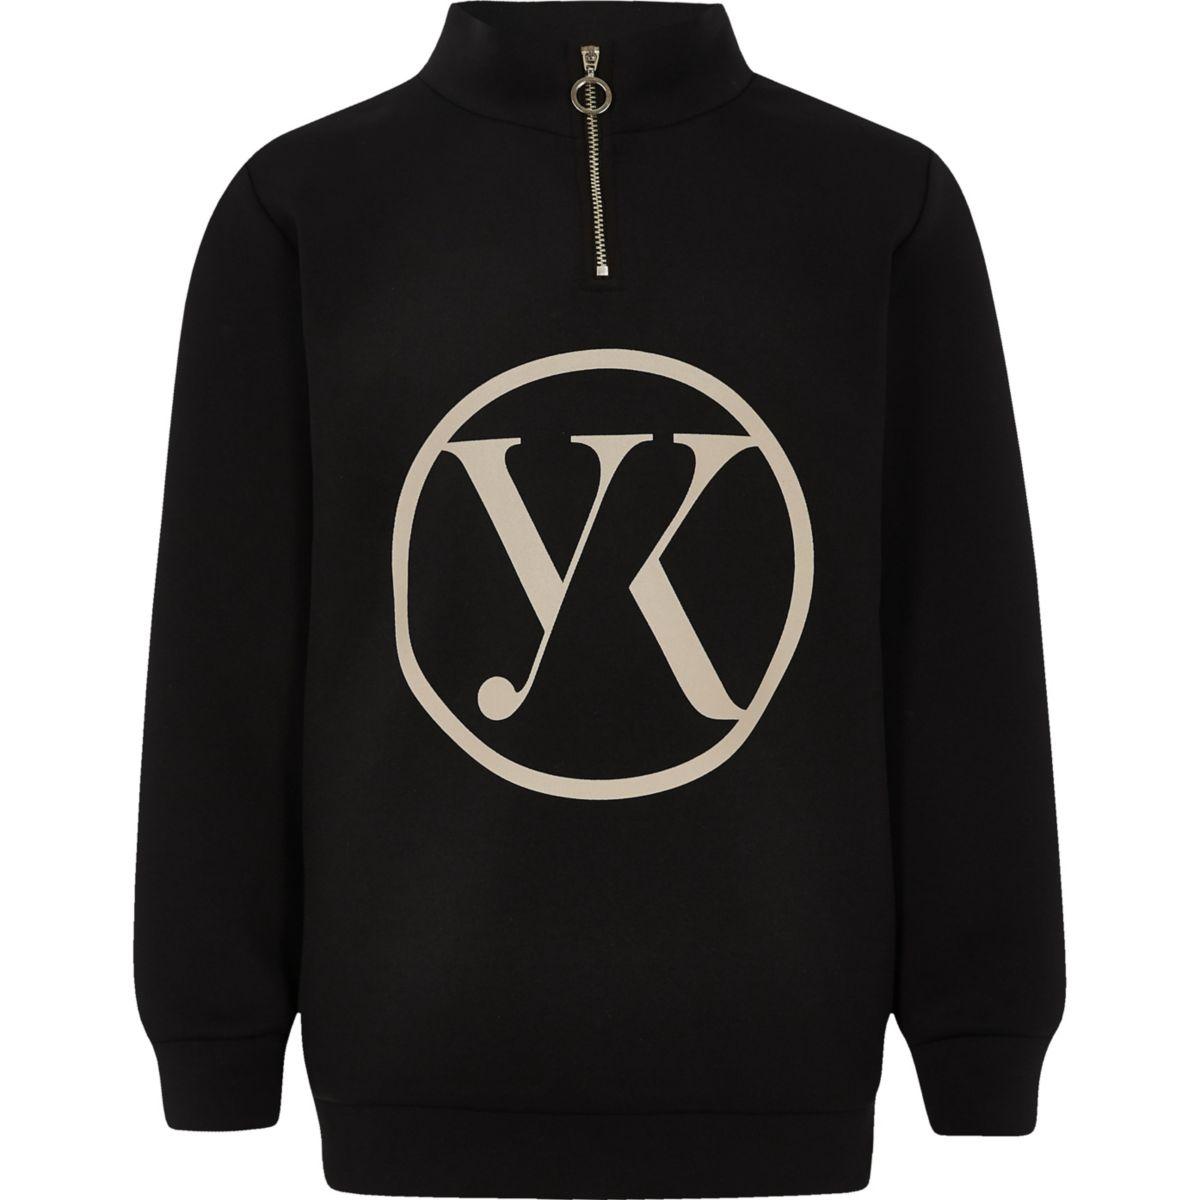 Be inclusive black zip up sweater